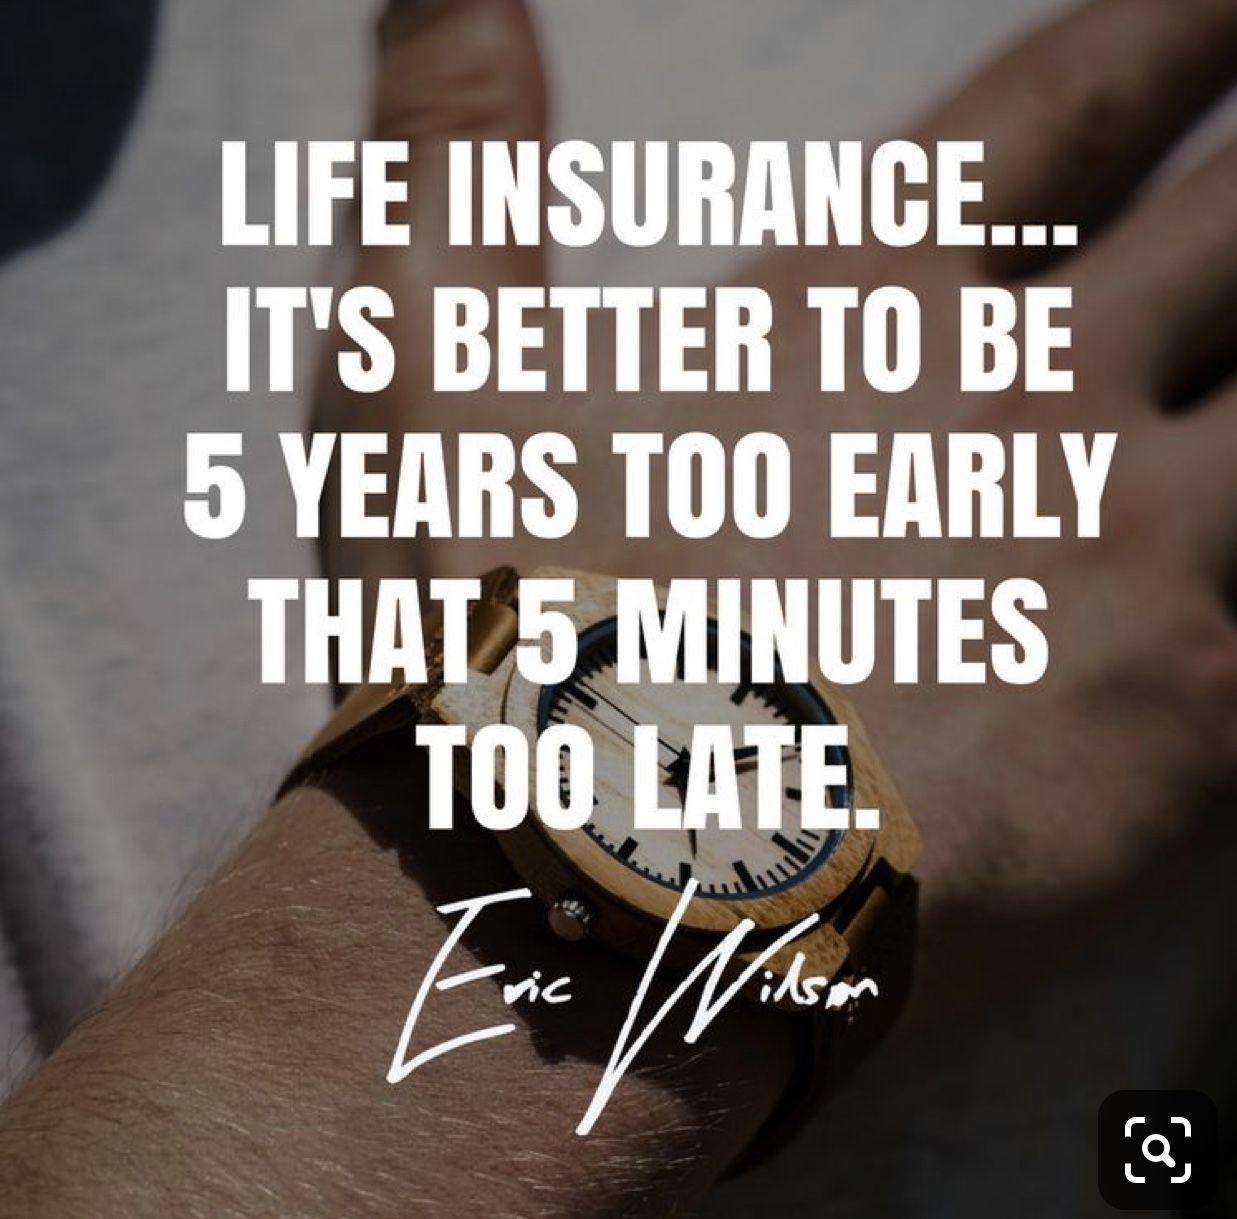 Life insurance quote #insurancequotes